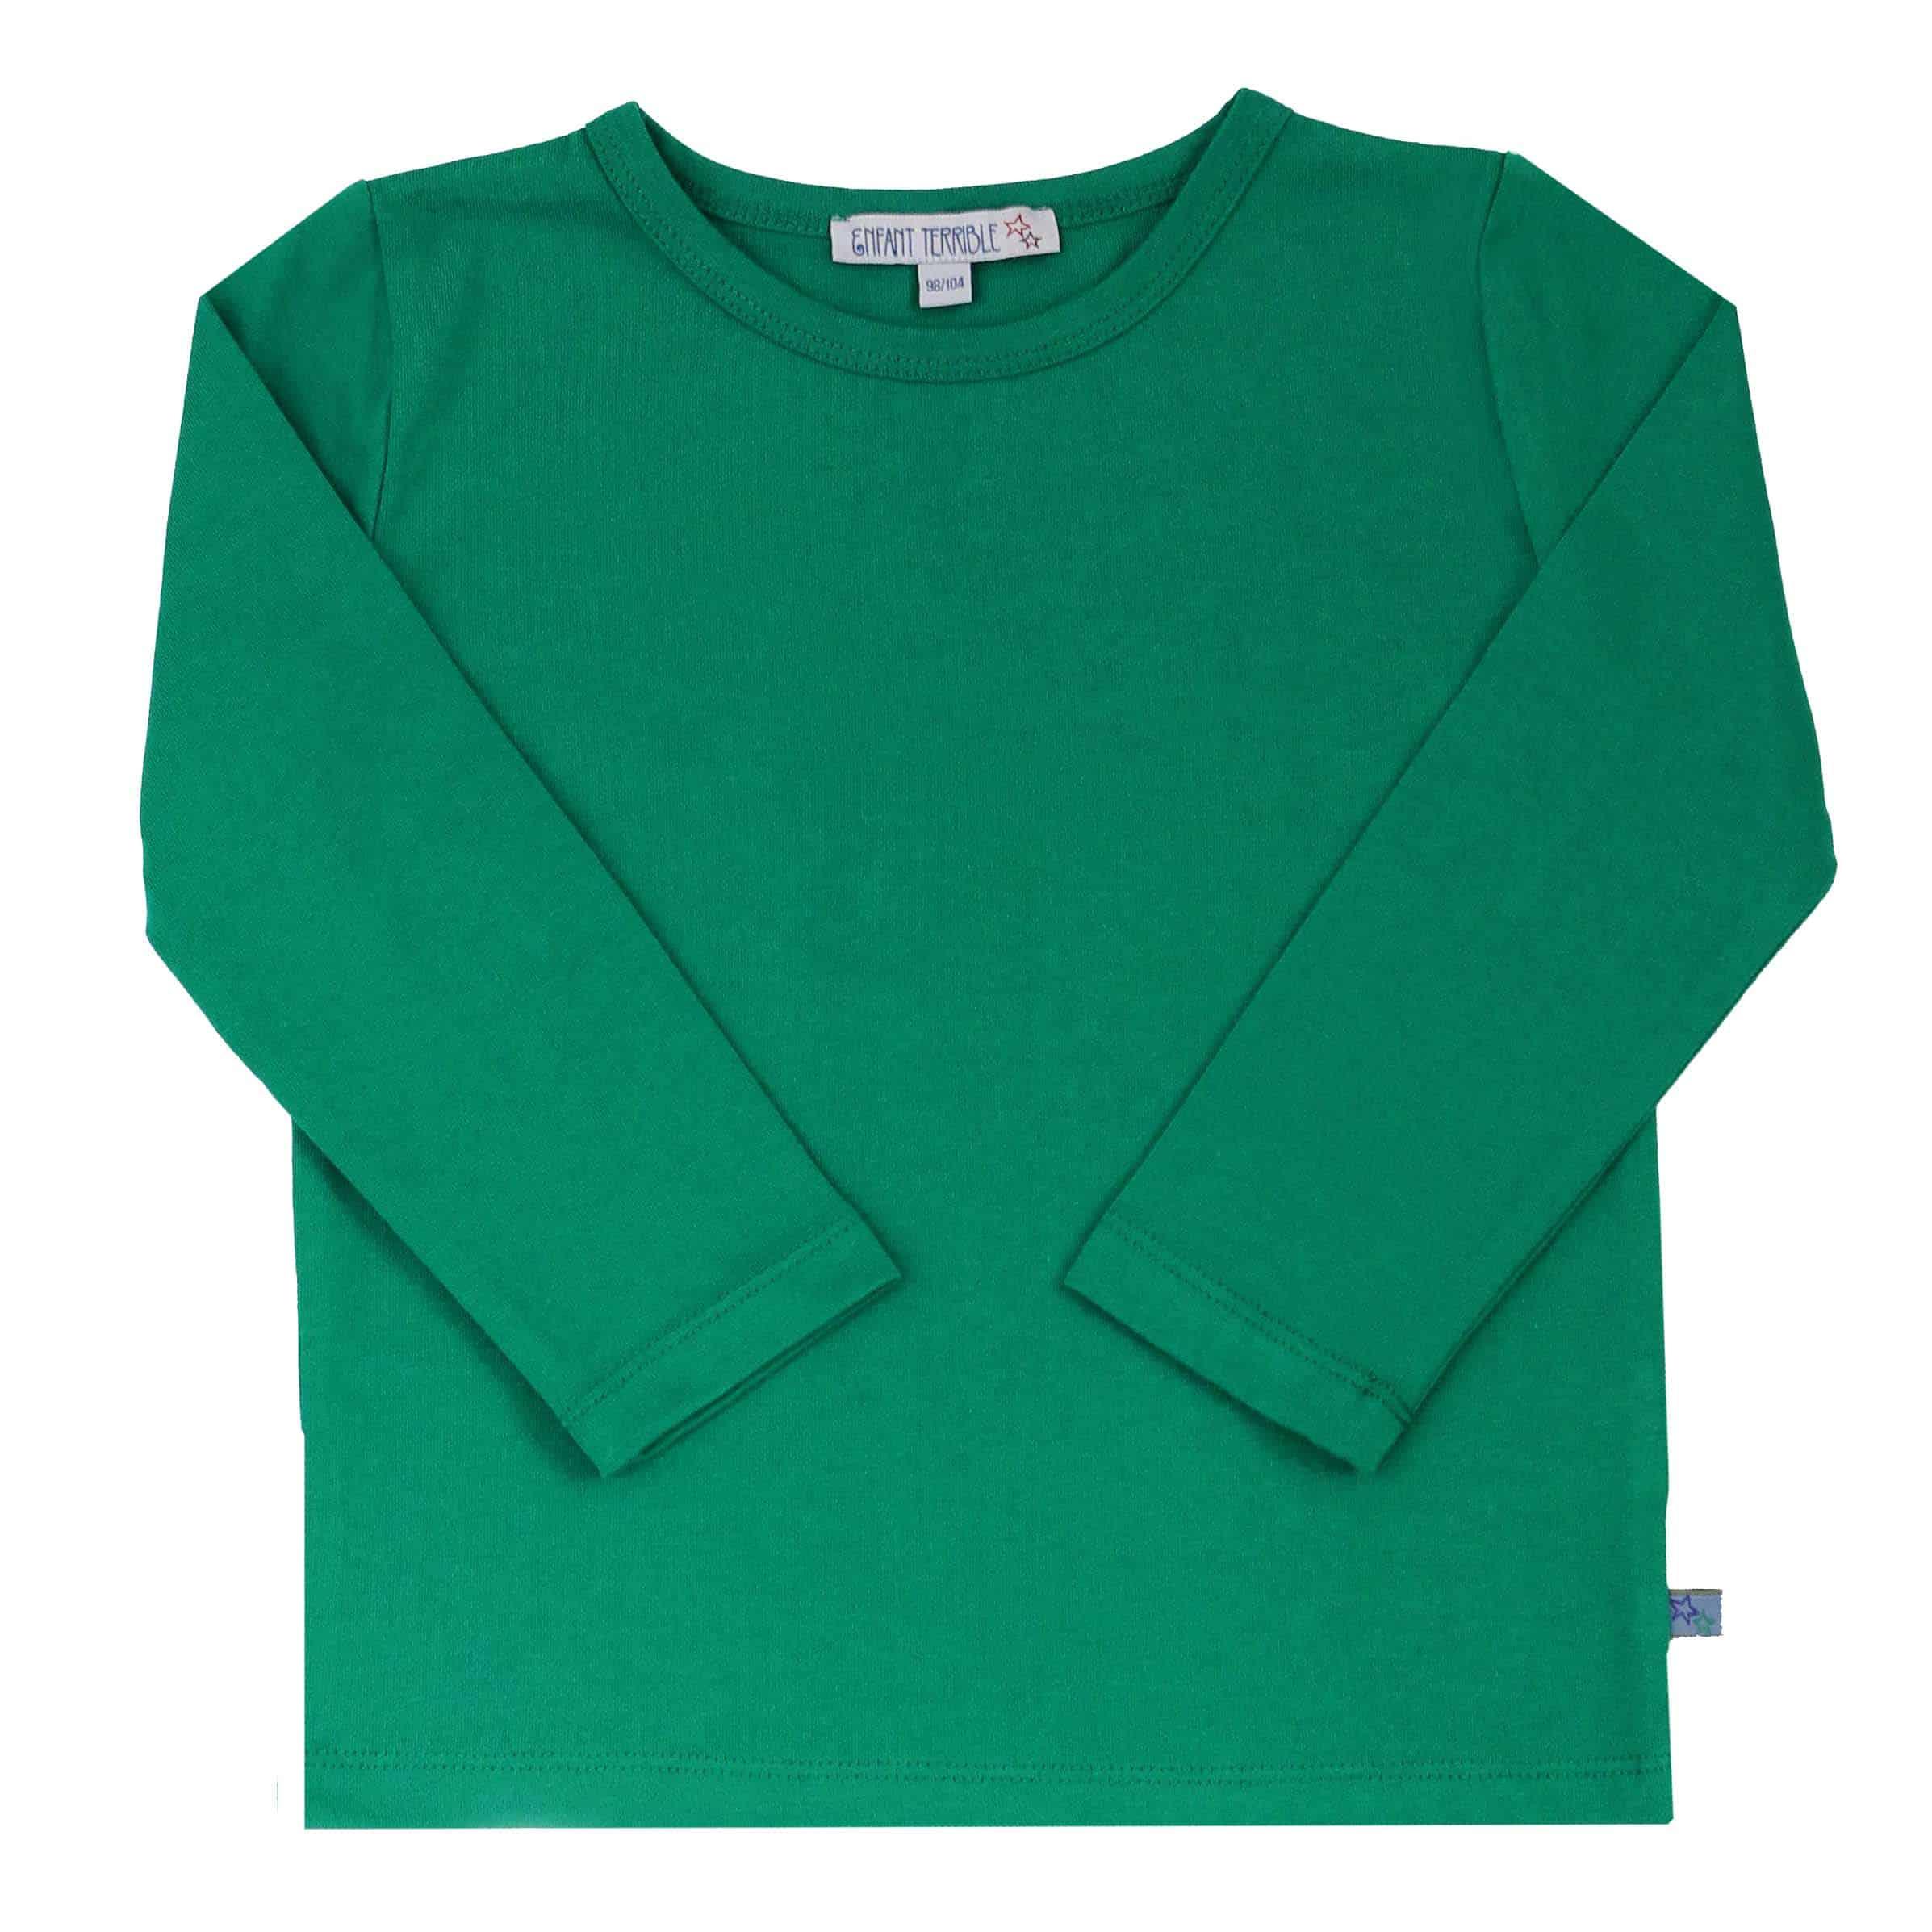 promo code 90a31 a67e3 Enfant Terrible Langarm-Shirt uni smaragd grün